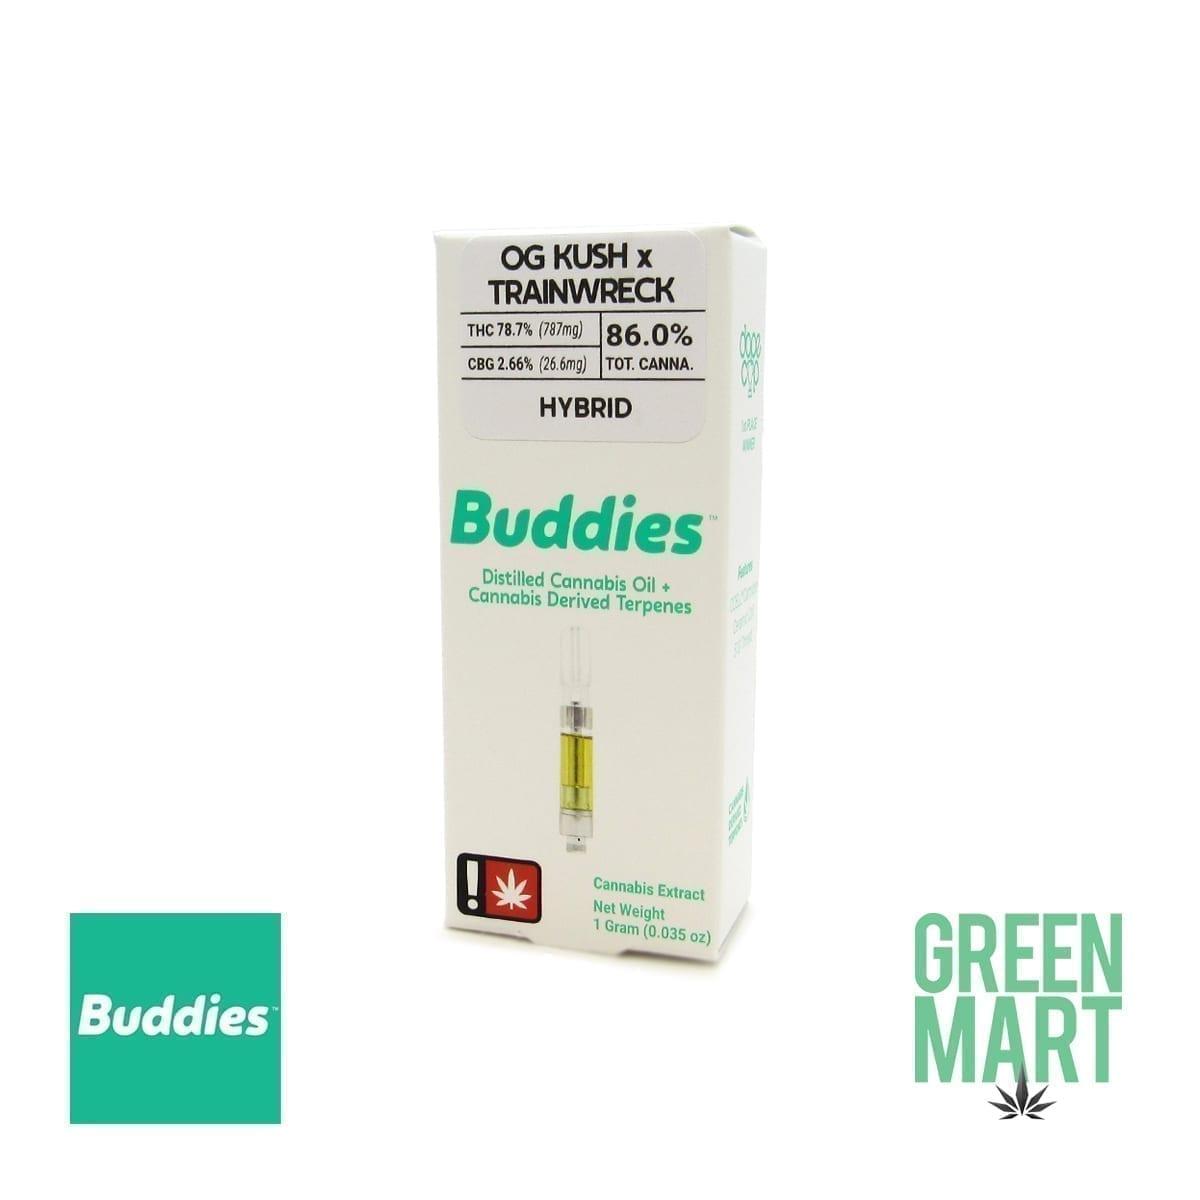 Buddies Brand Distillate Cartridge - OG Kush X Trainwreck